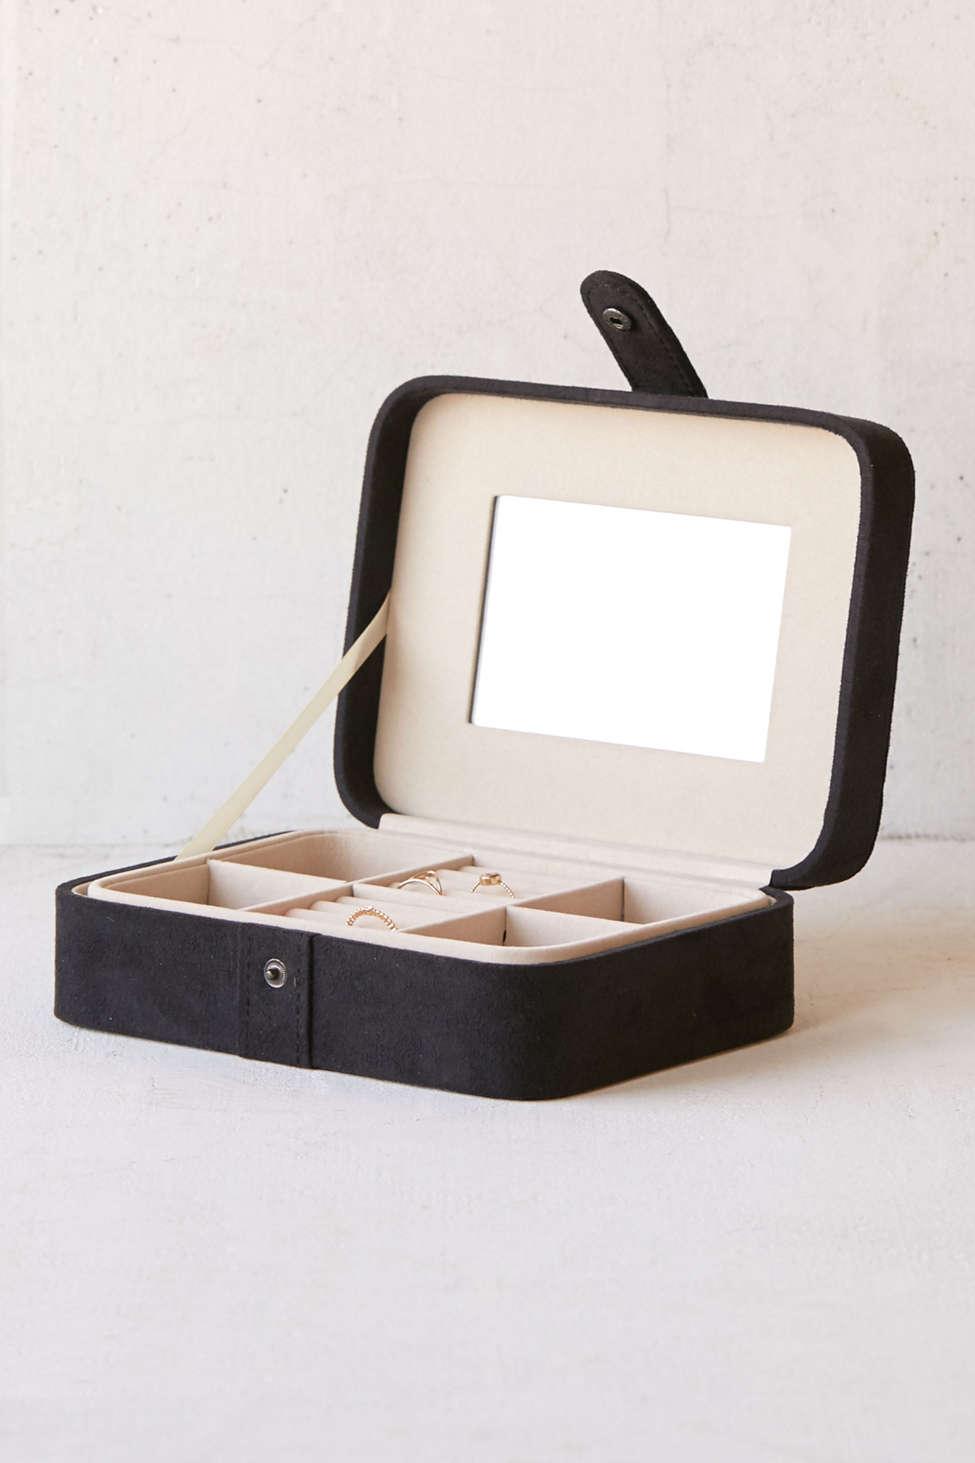 Slide View: 1: Mele & Co. Giana Flocked Travel Jewelry Box